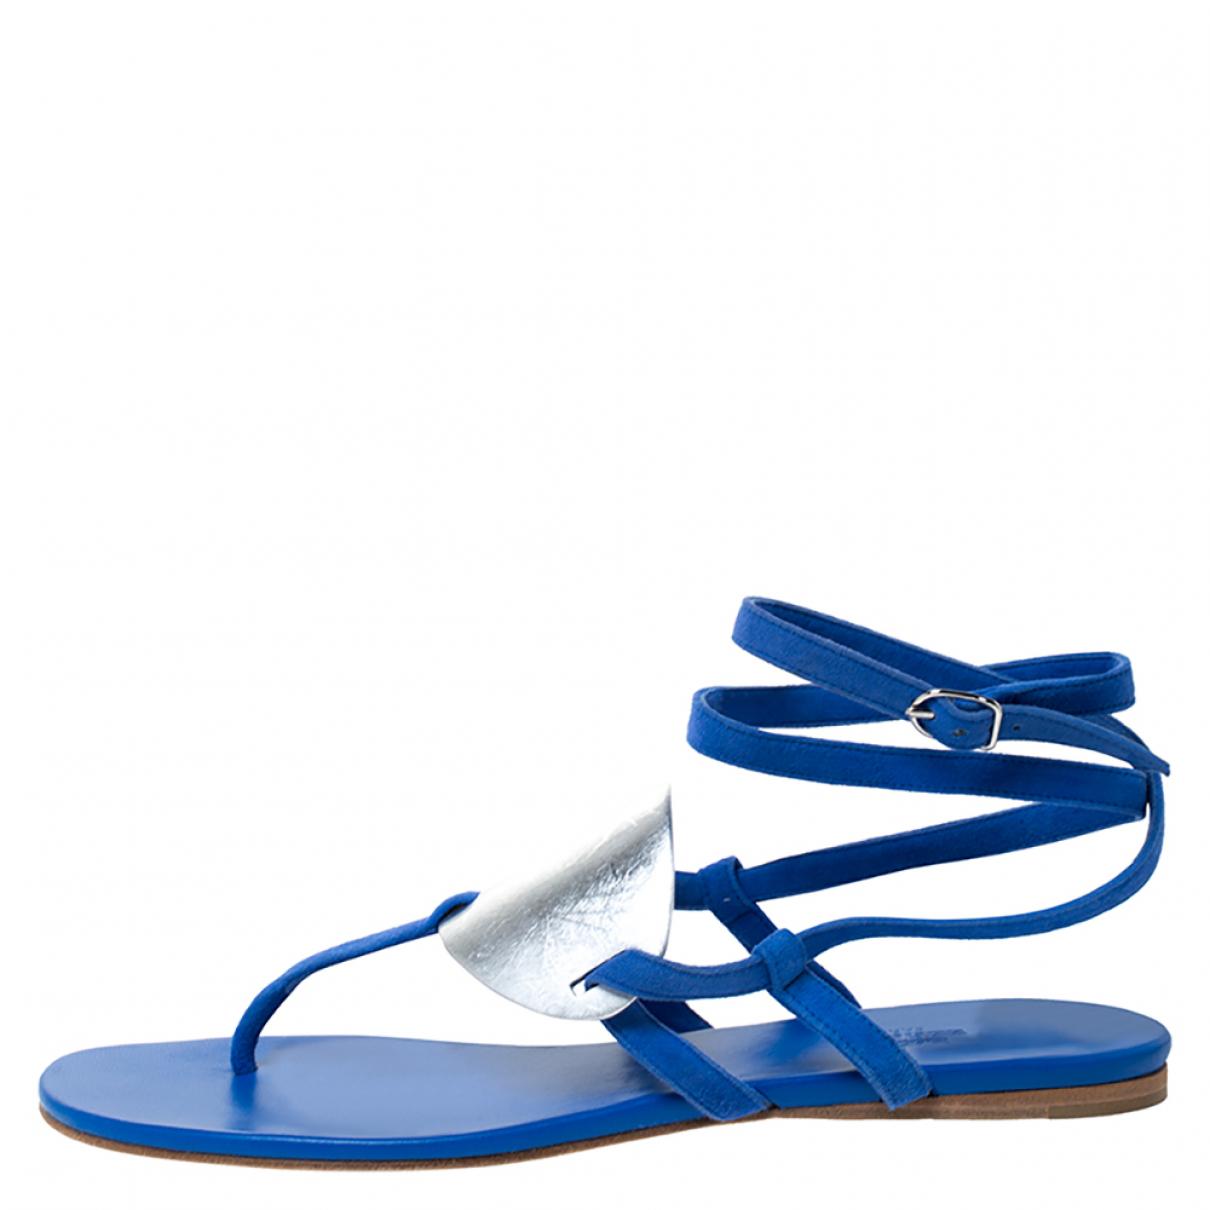 Hermès \N Blue Suede Flats for Women 9 US